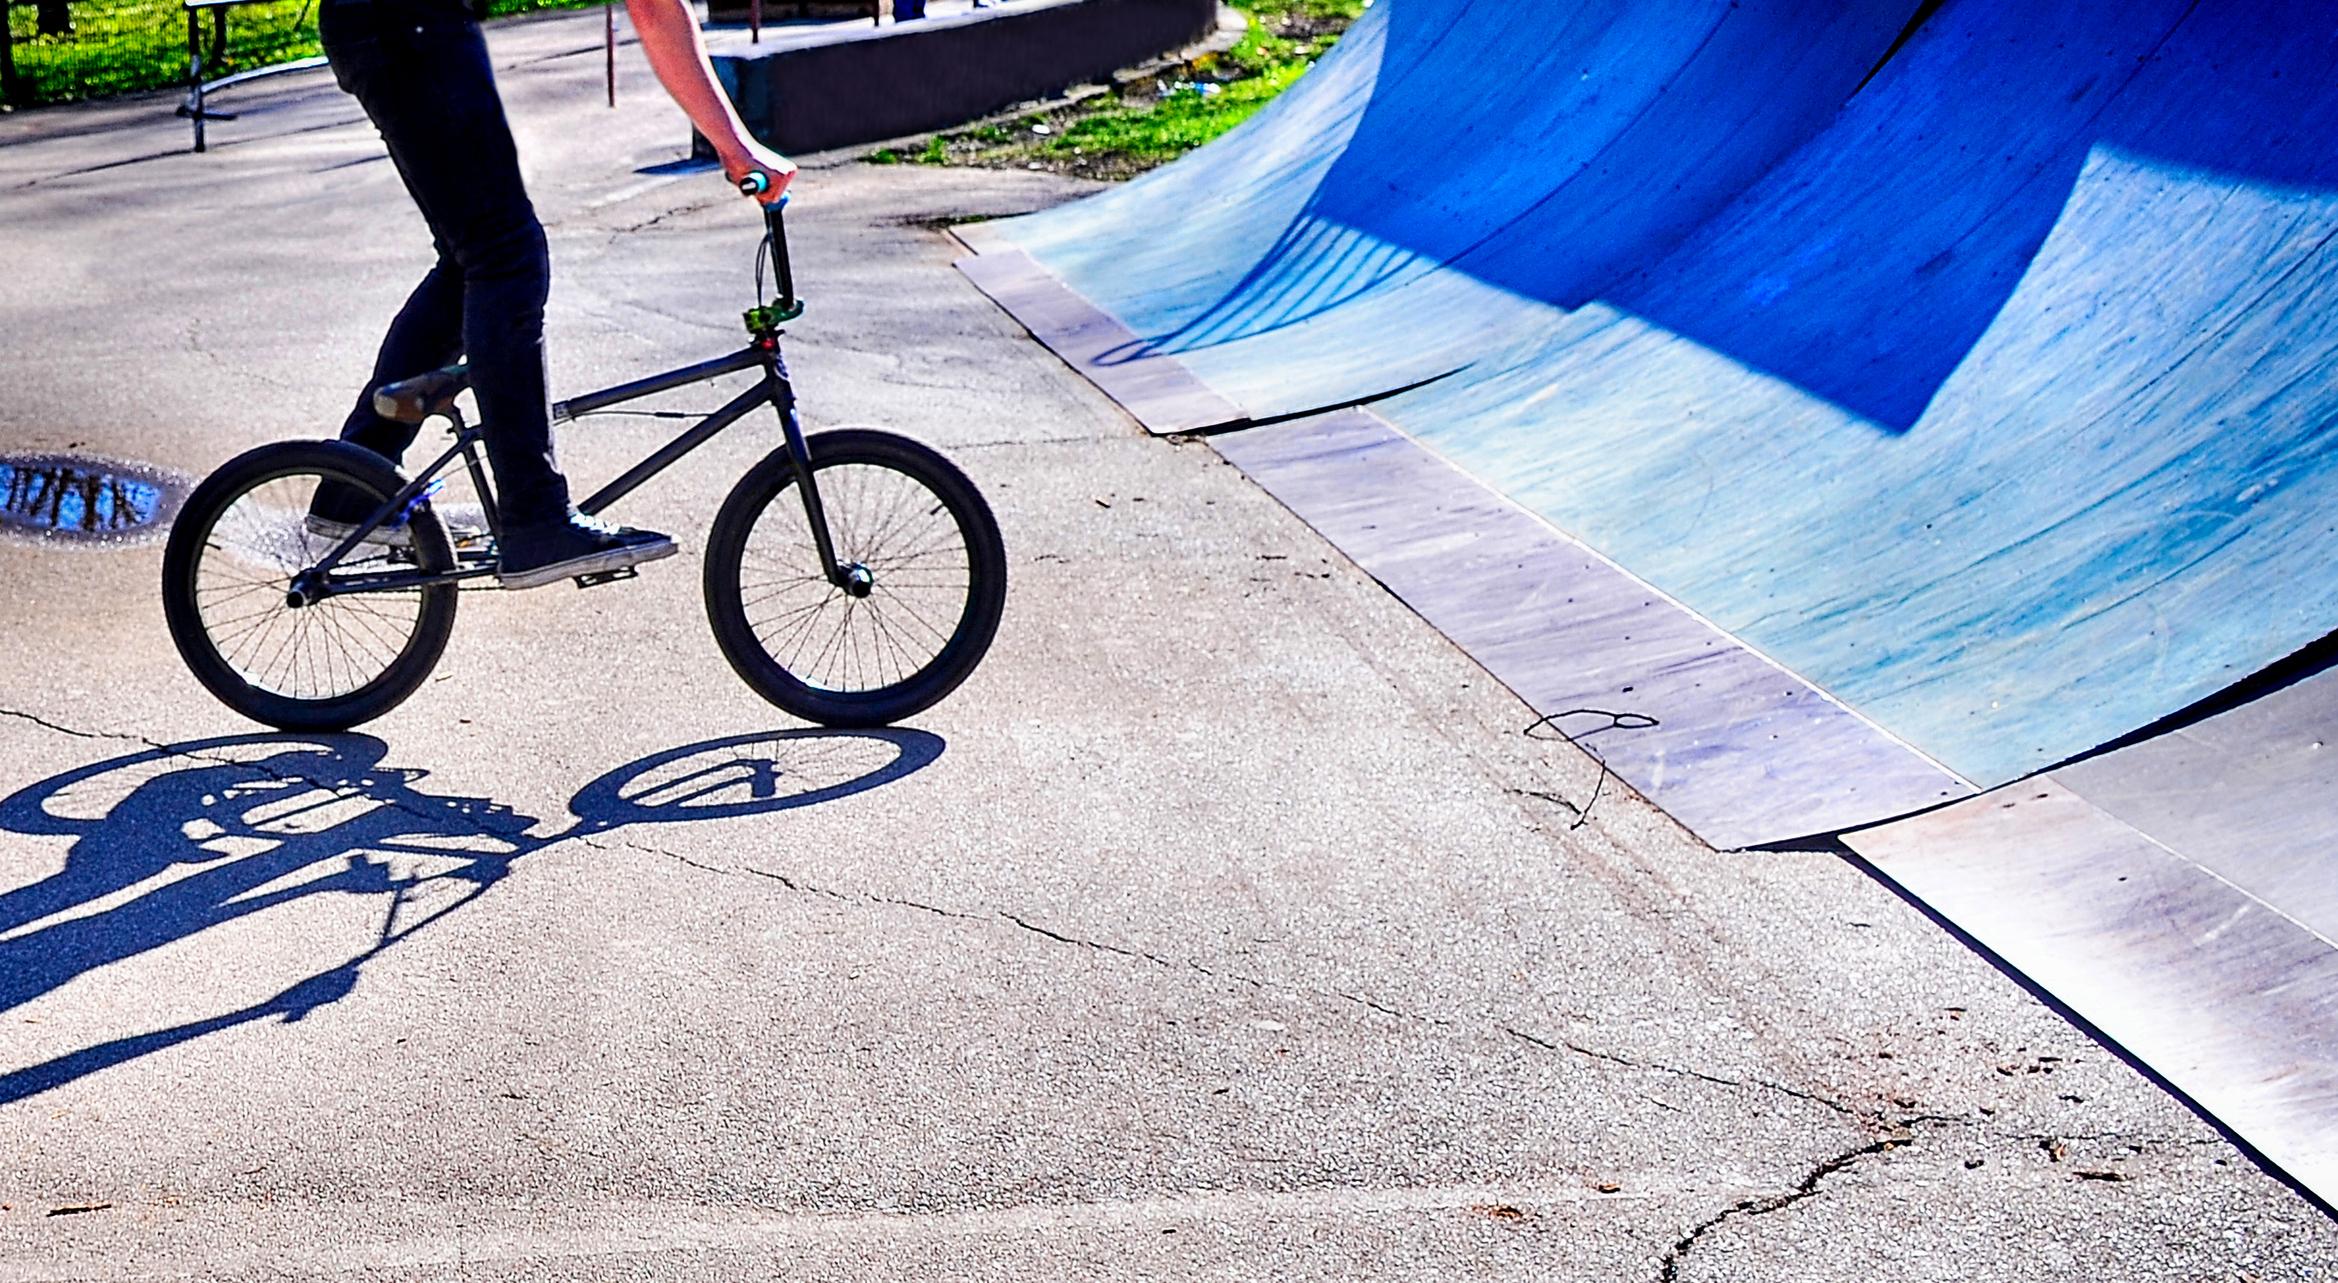 Urban BMX riding